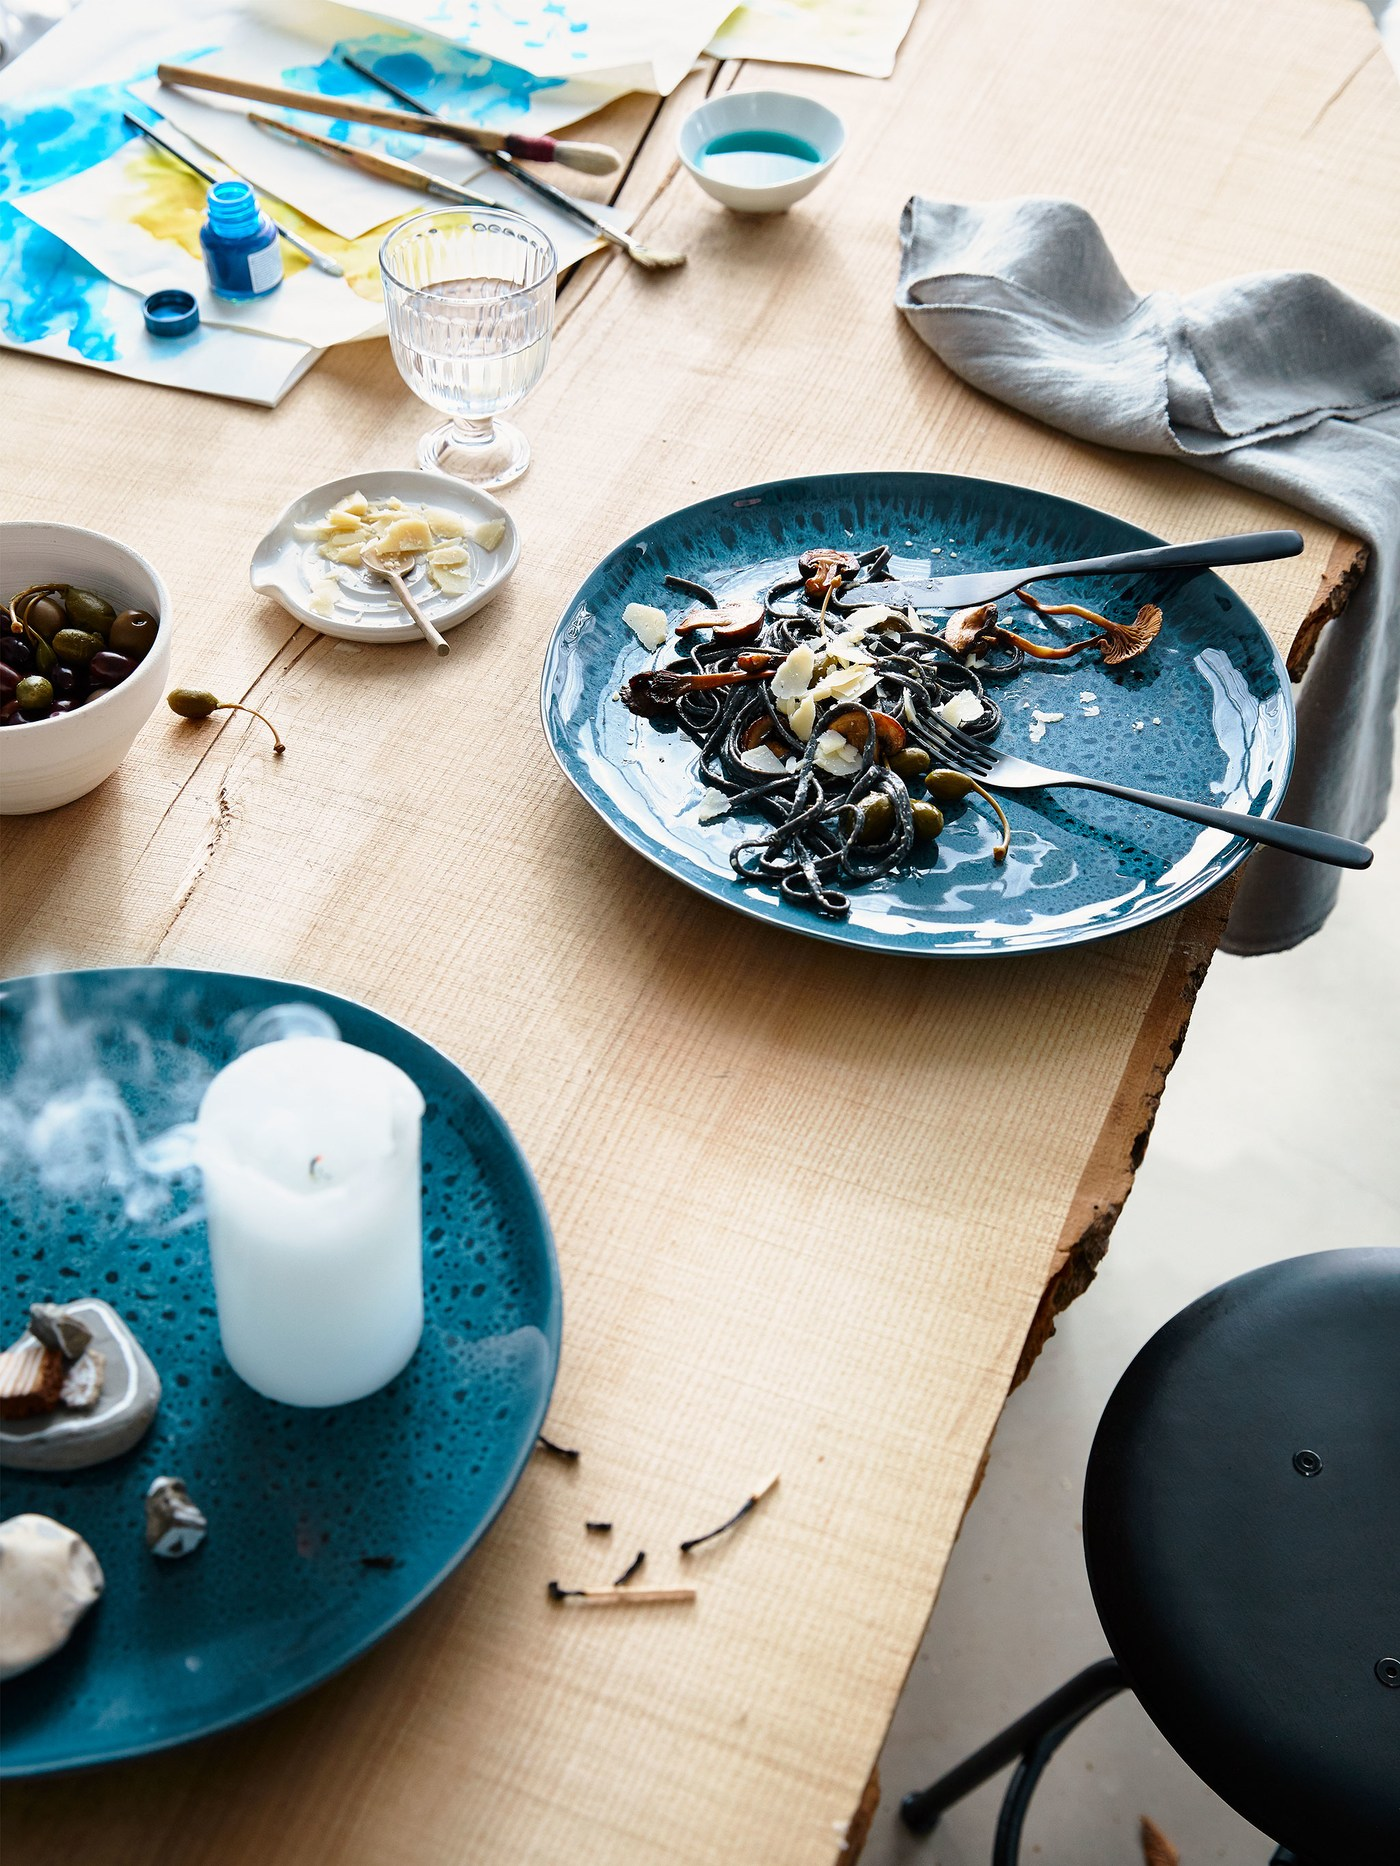 Ikea & Tableware u0026 Crockery - IKEA